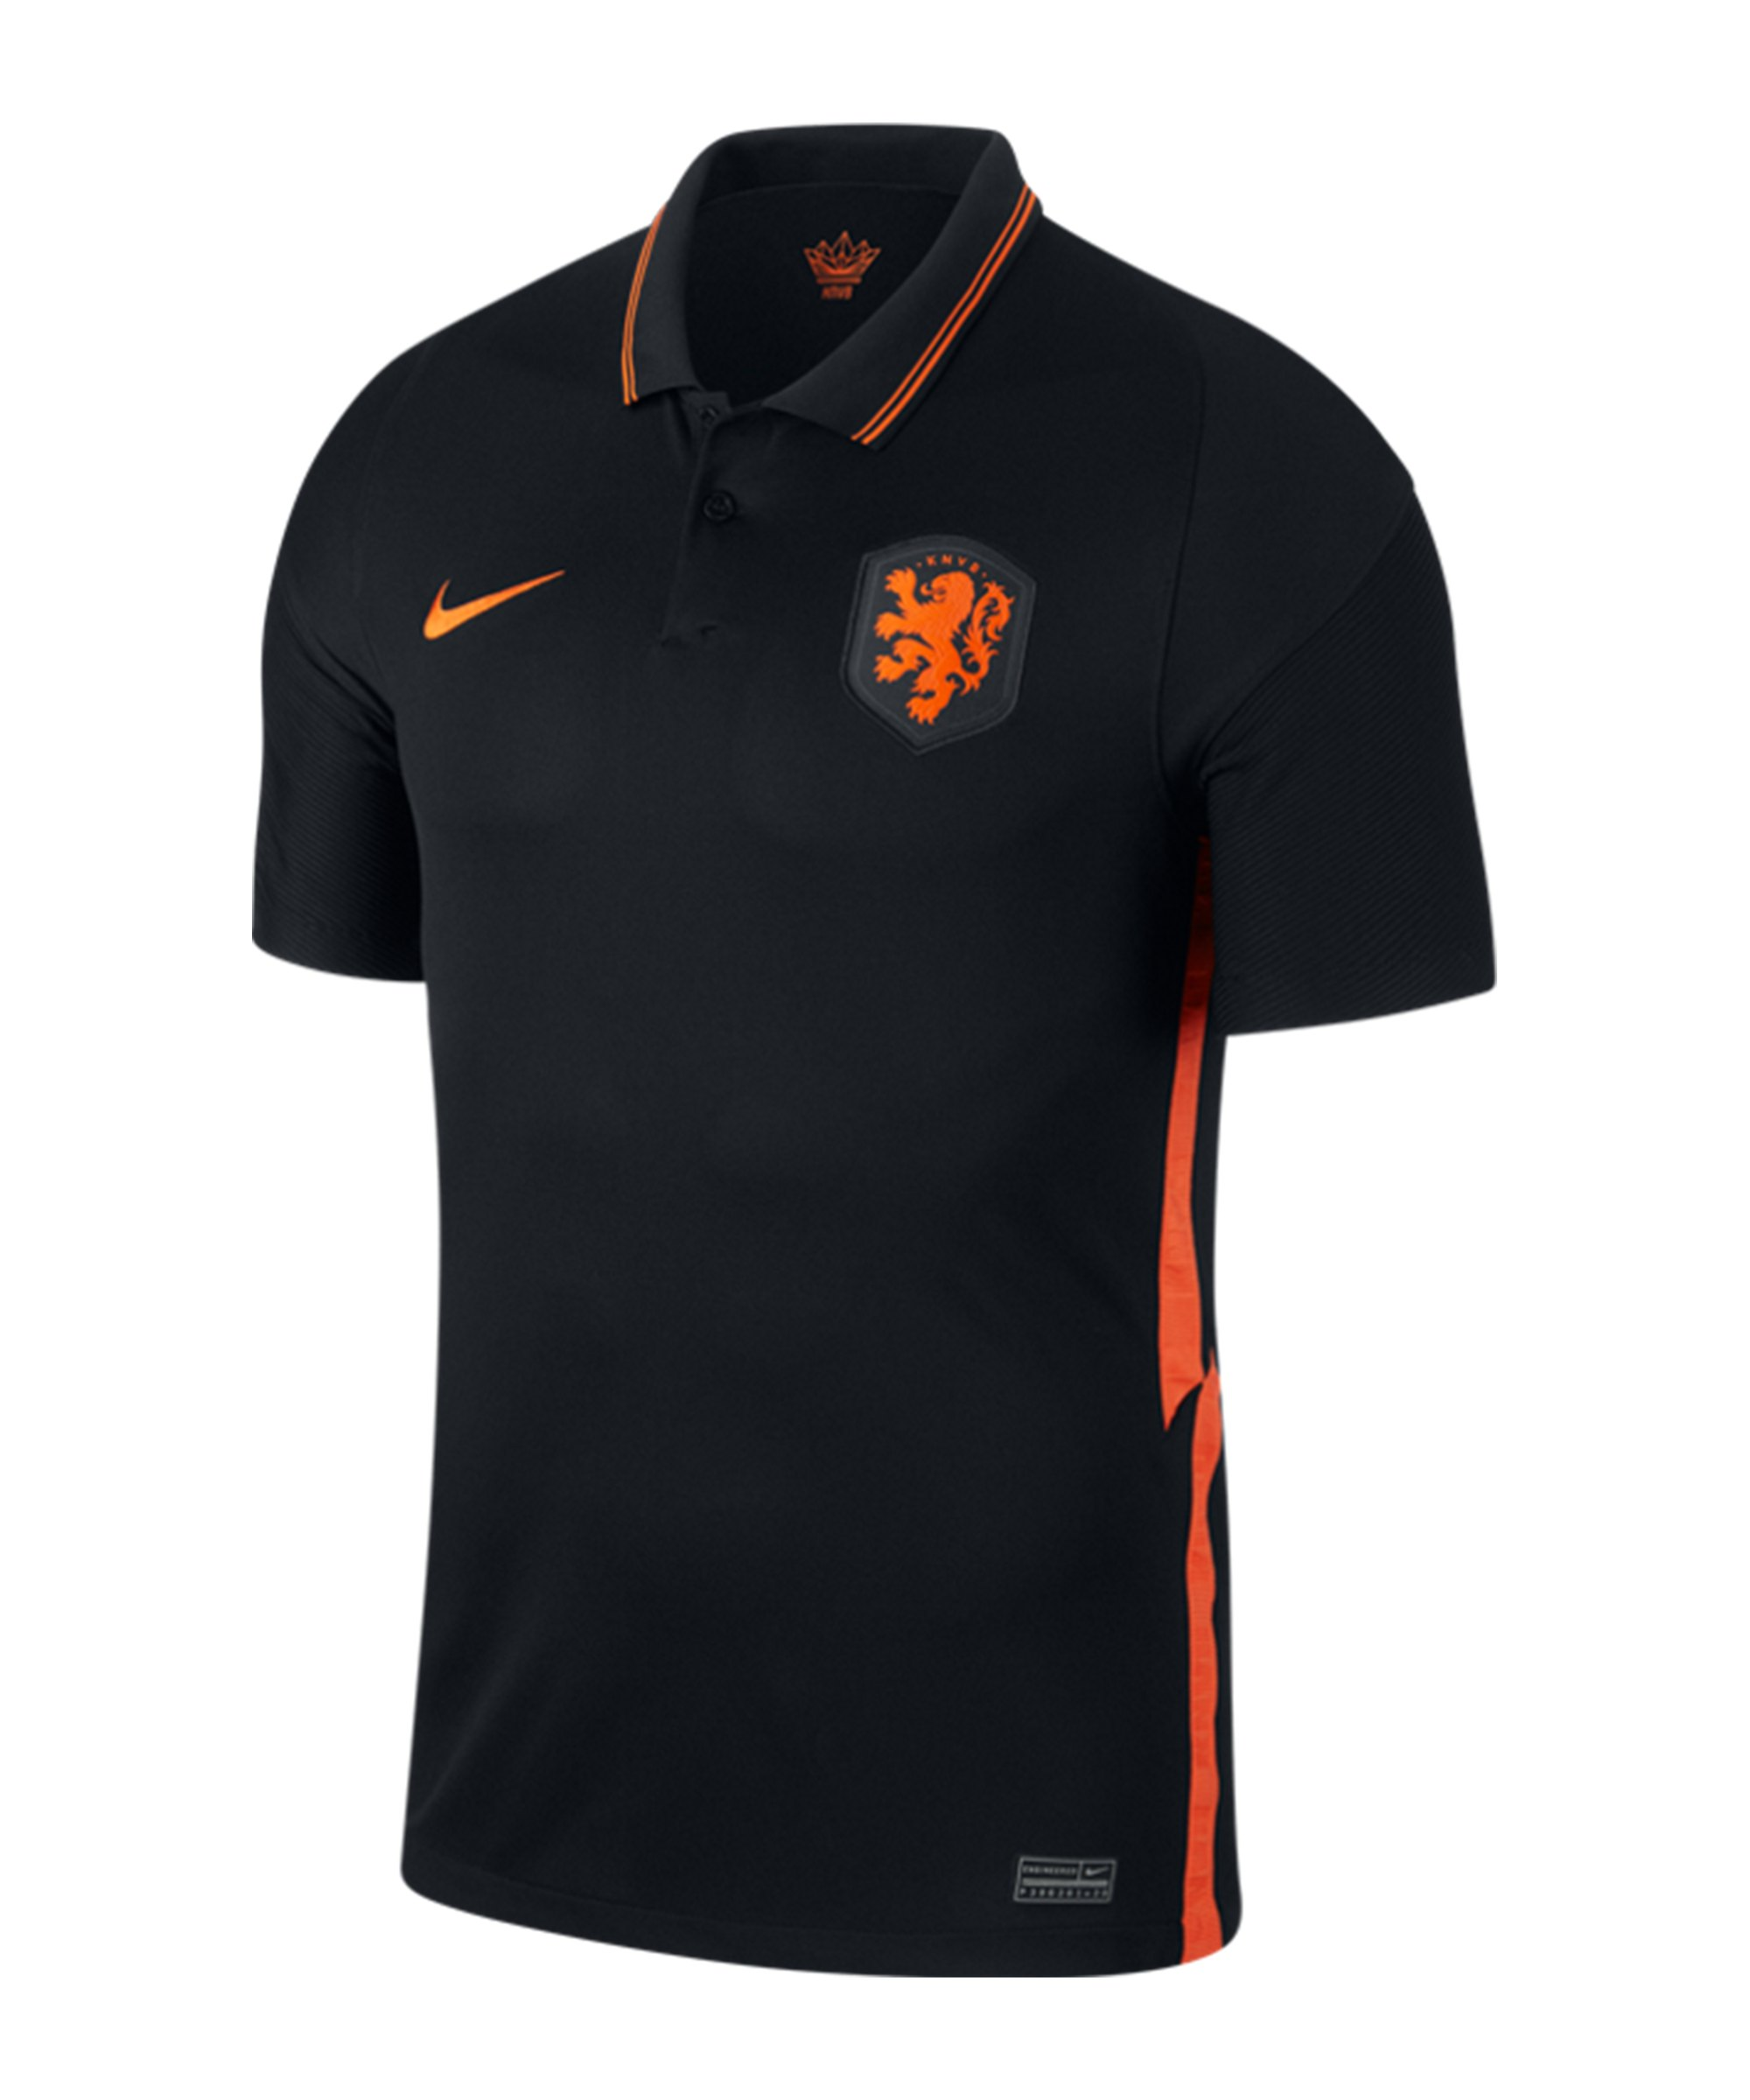 Nike Niederlande Trikot Away EM 2020 Schwarz F010 - schwarz